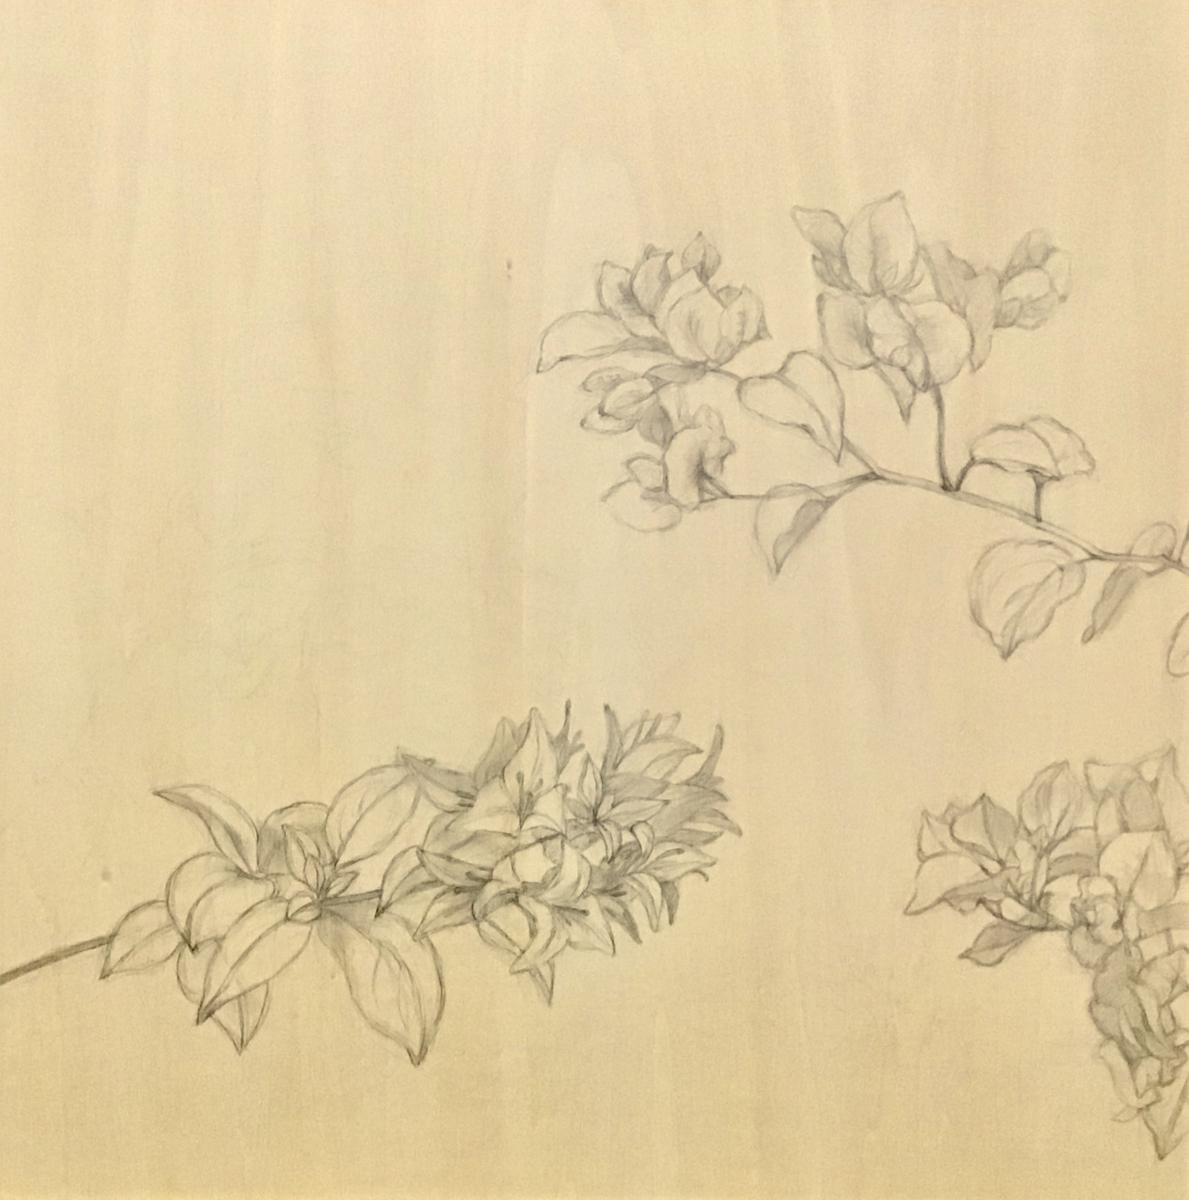 f:id:daikouji:20201201163722j:plain